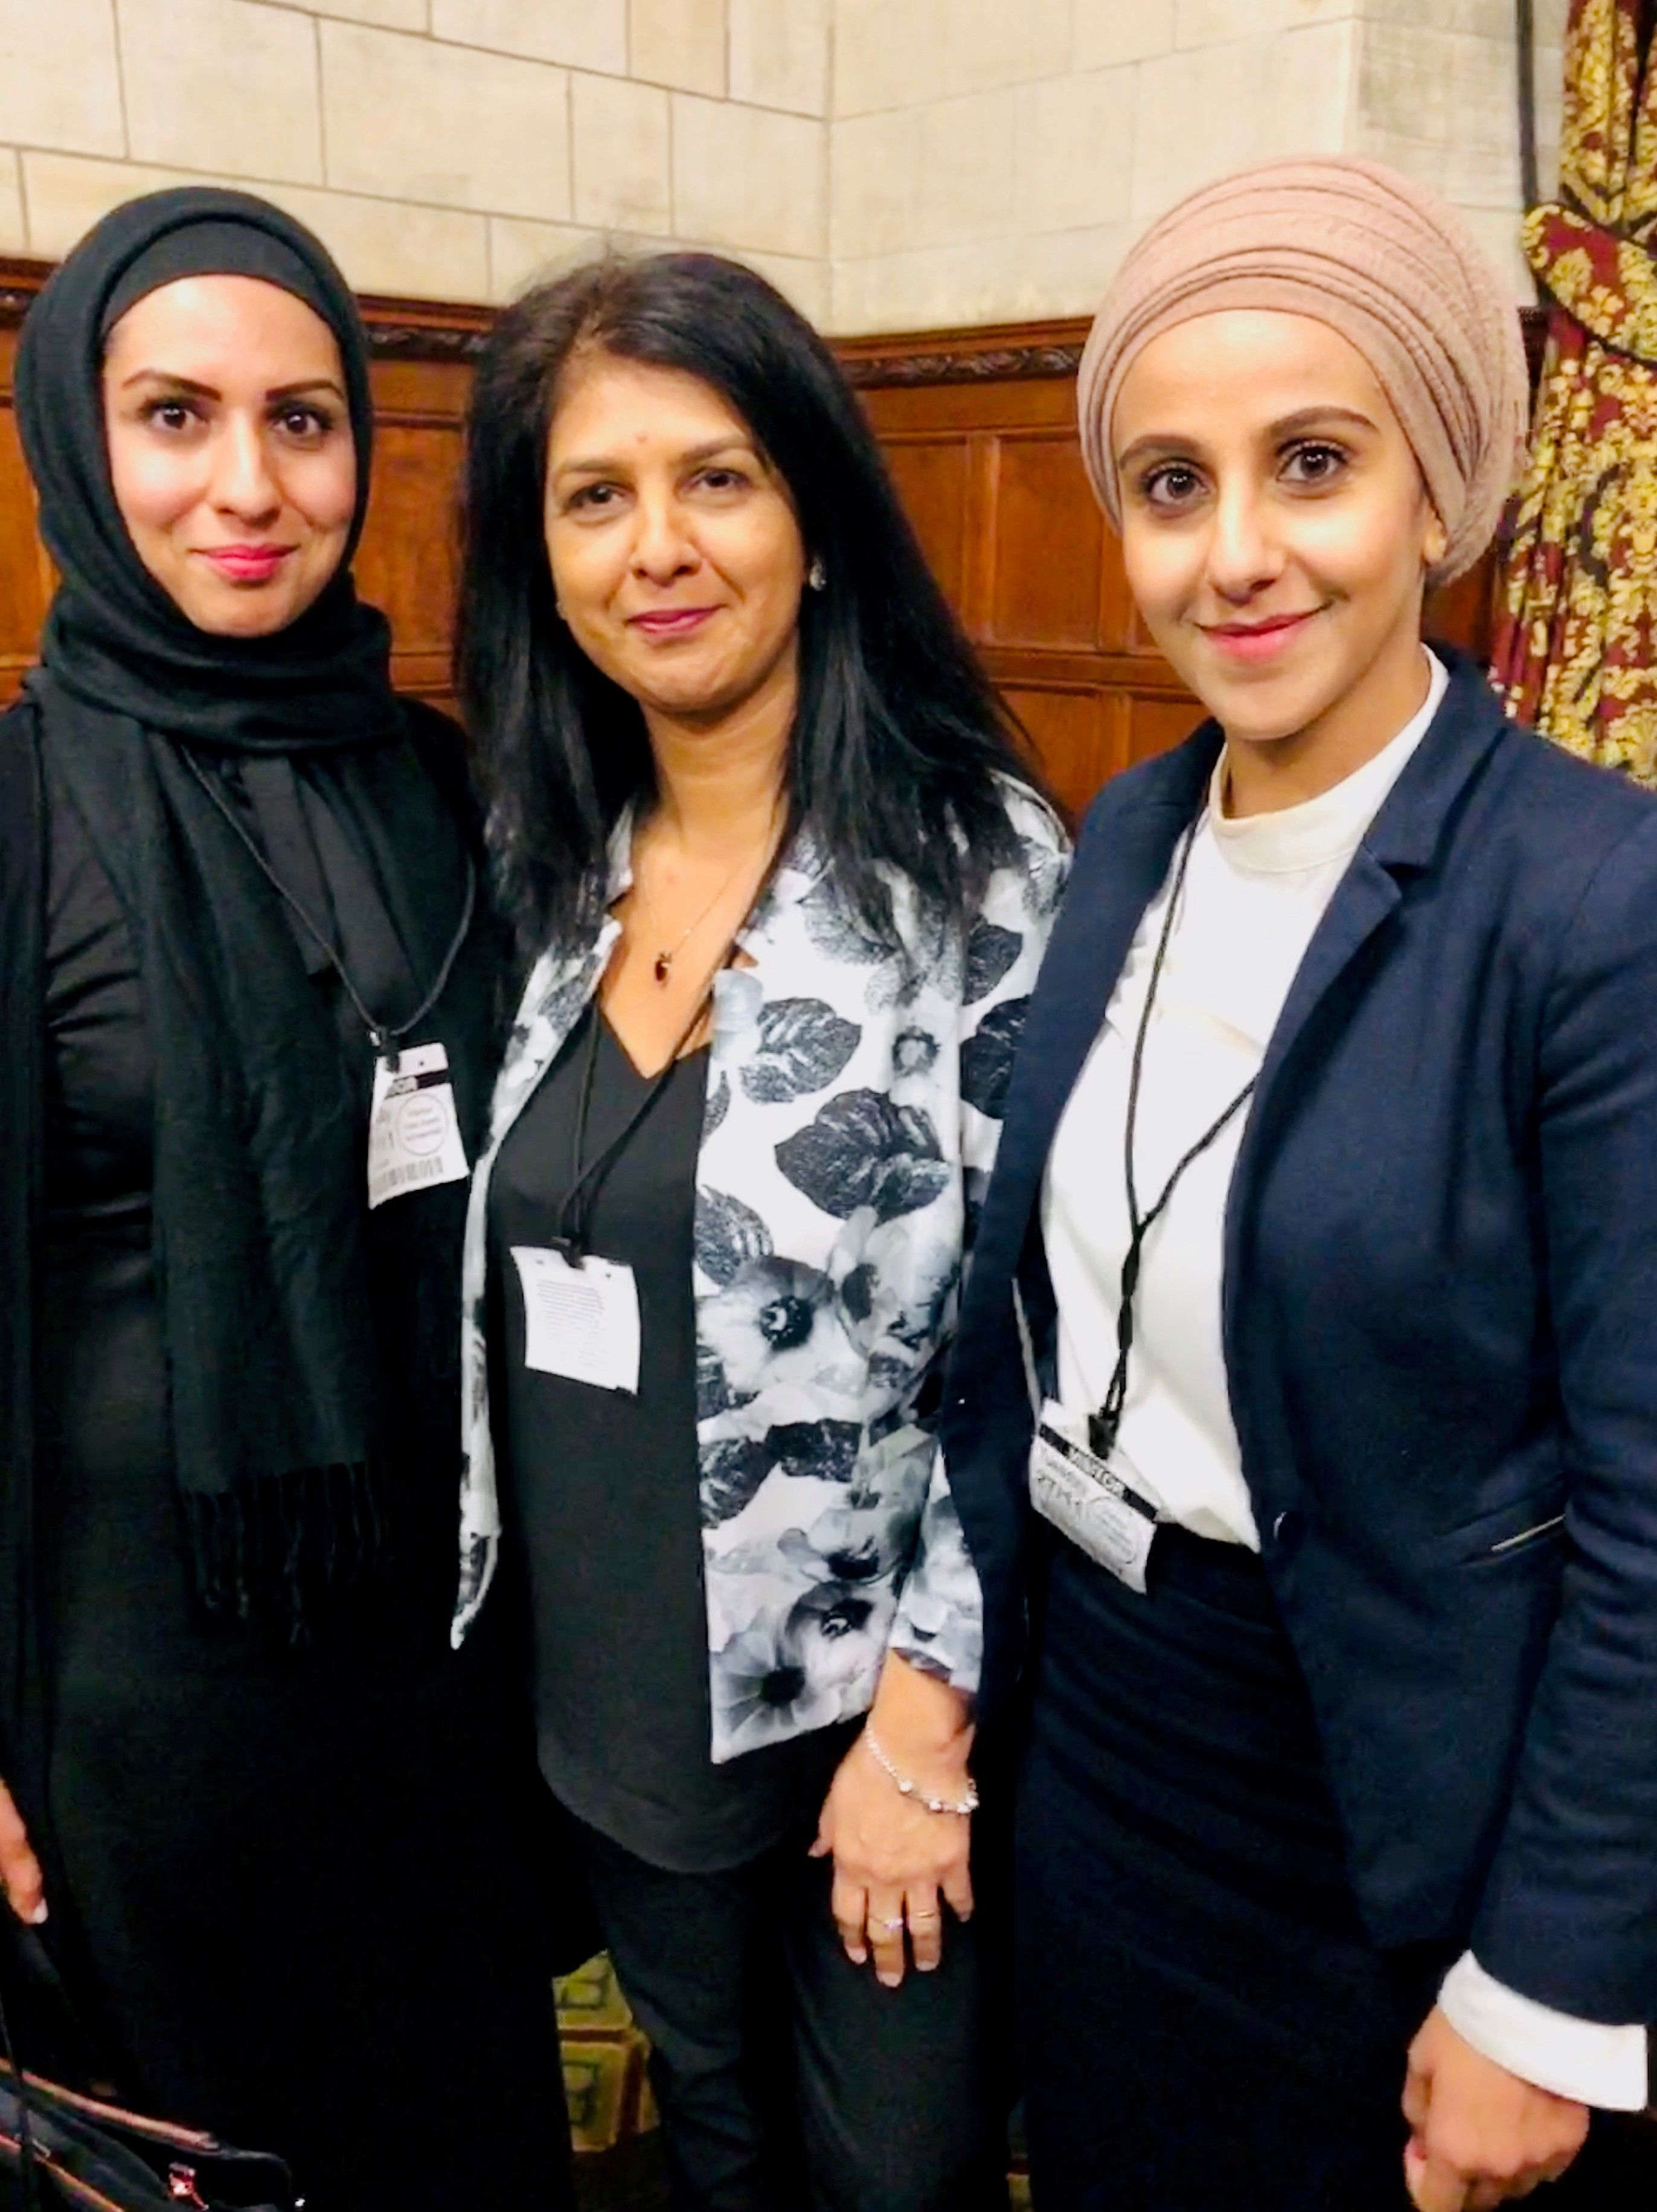 Raffia Arshad and Miriam Yafai invited to the House of Common   (L-R) Raffia Arshad, Sarbjit Athwal, Miriam Yafai  PIC: St.Mary's Chambers